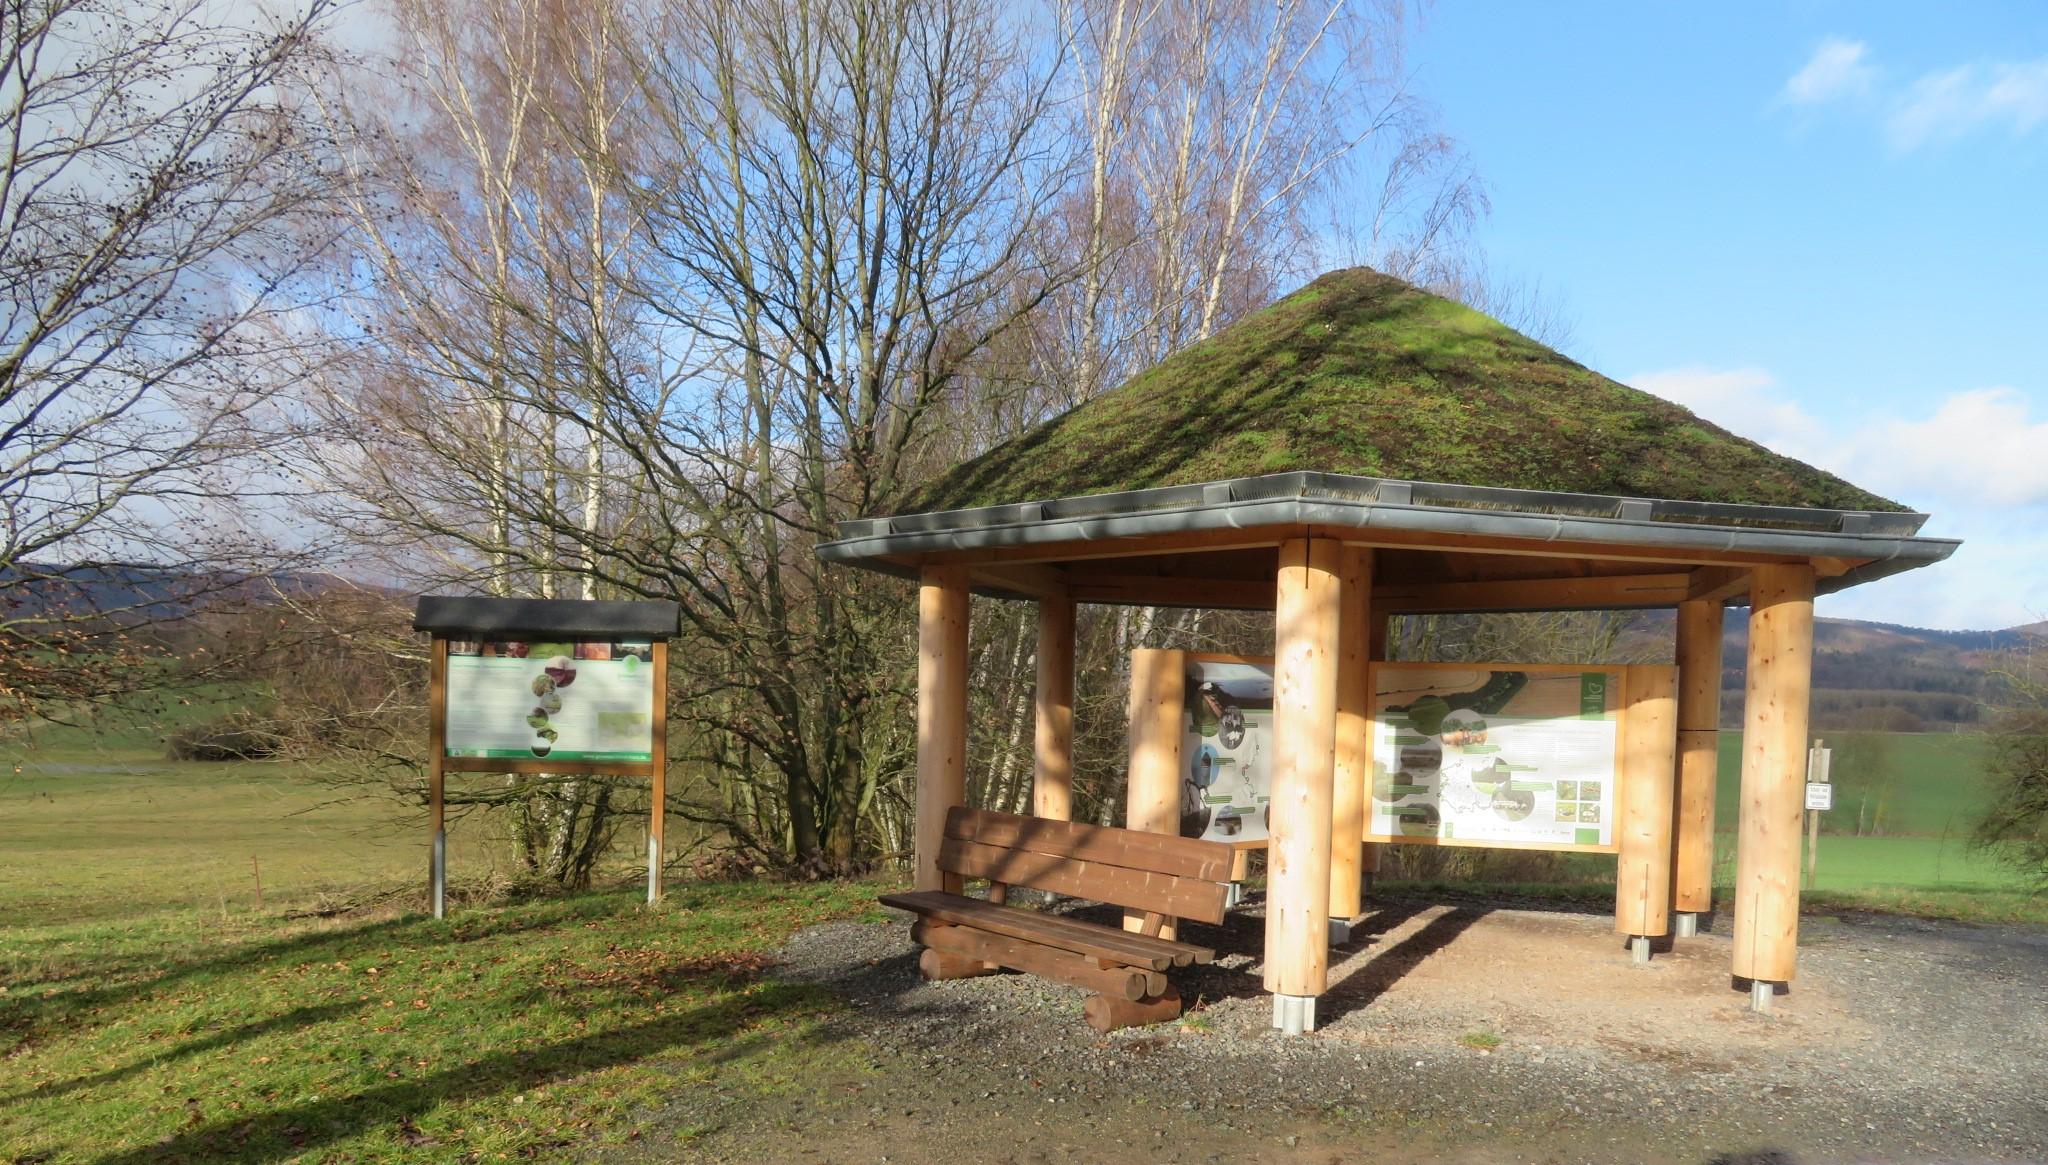 Ellrich Infopavillon, Quelle: Ingrid Werres, Stiftung Naturschutz Thüringen